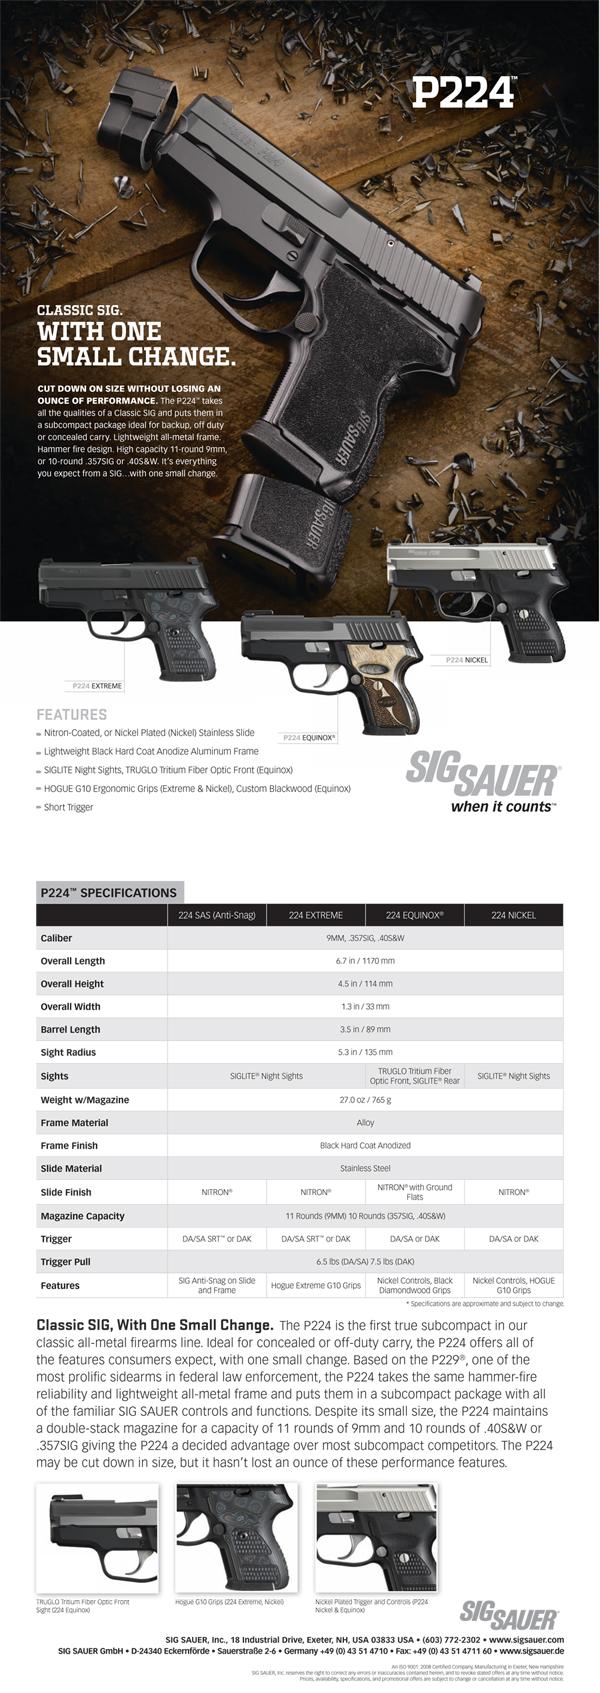 Sig Sauer P224 Sell Sheet